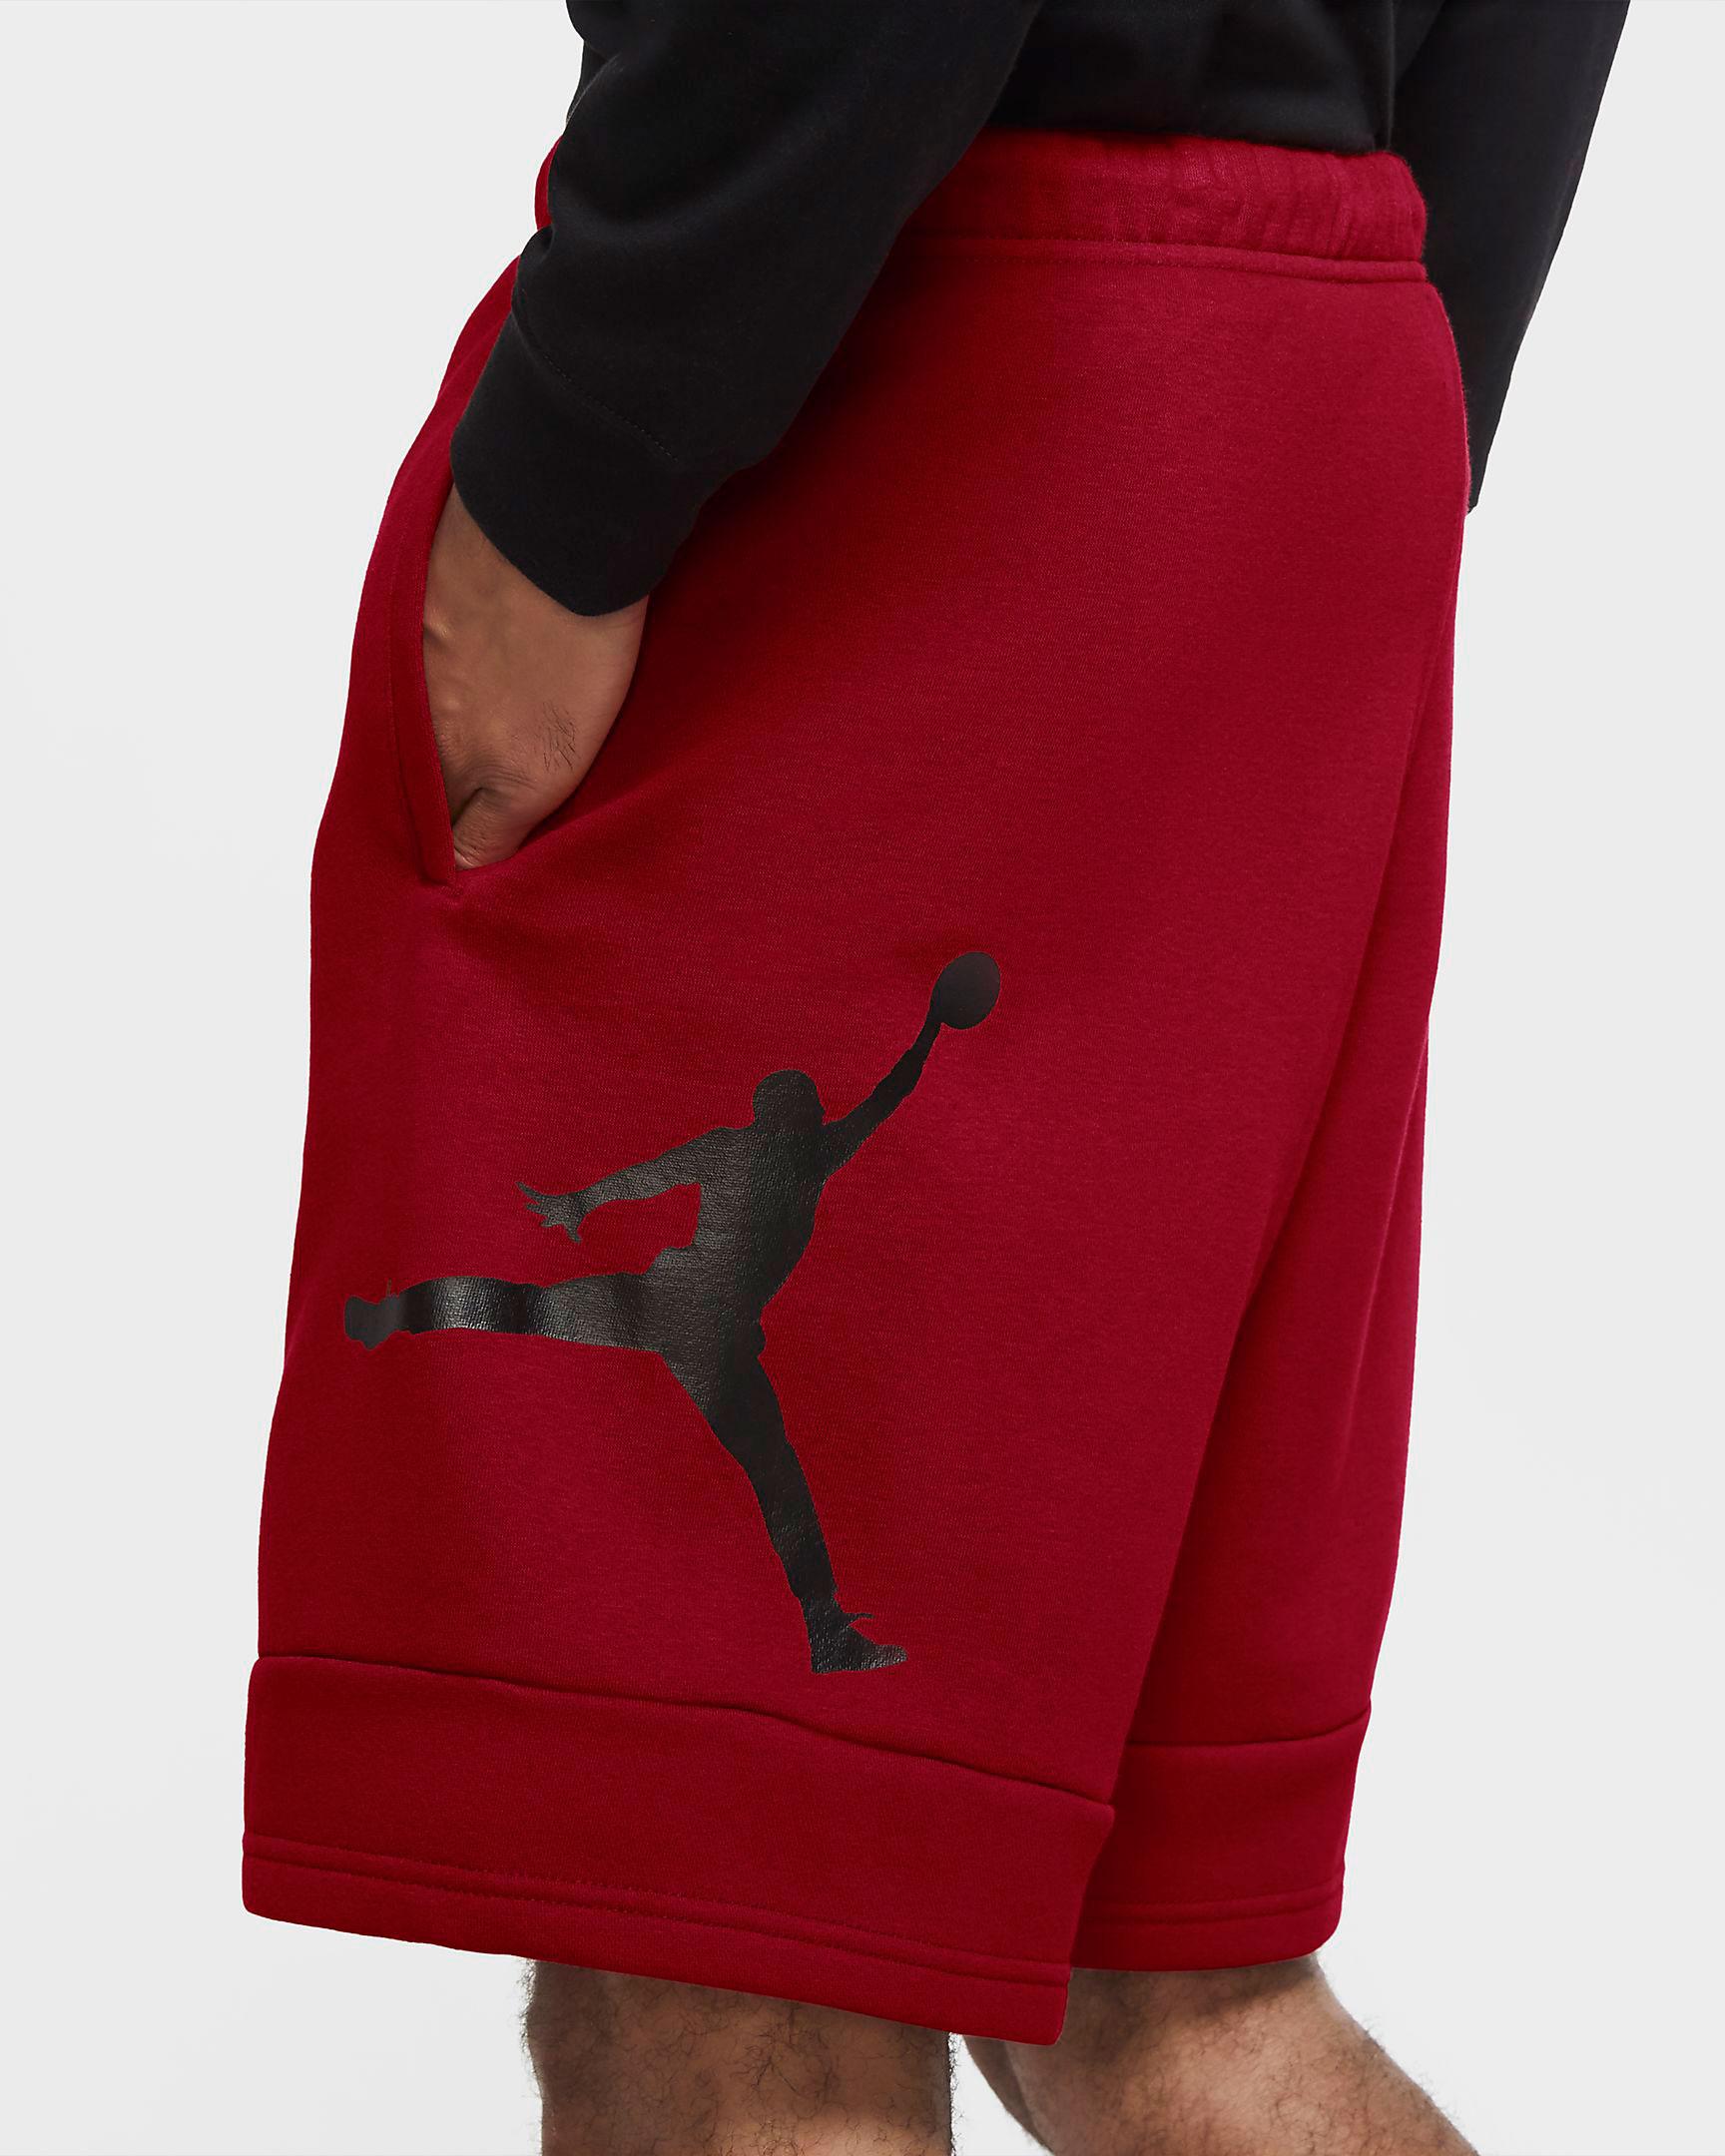 jordan-carmine-red-jumpman-fleece-shorts-3